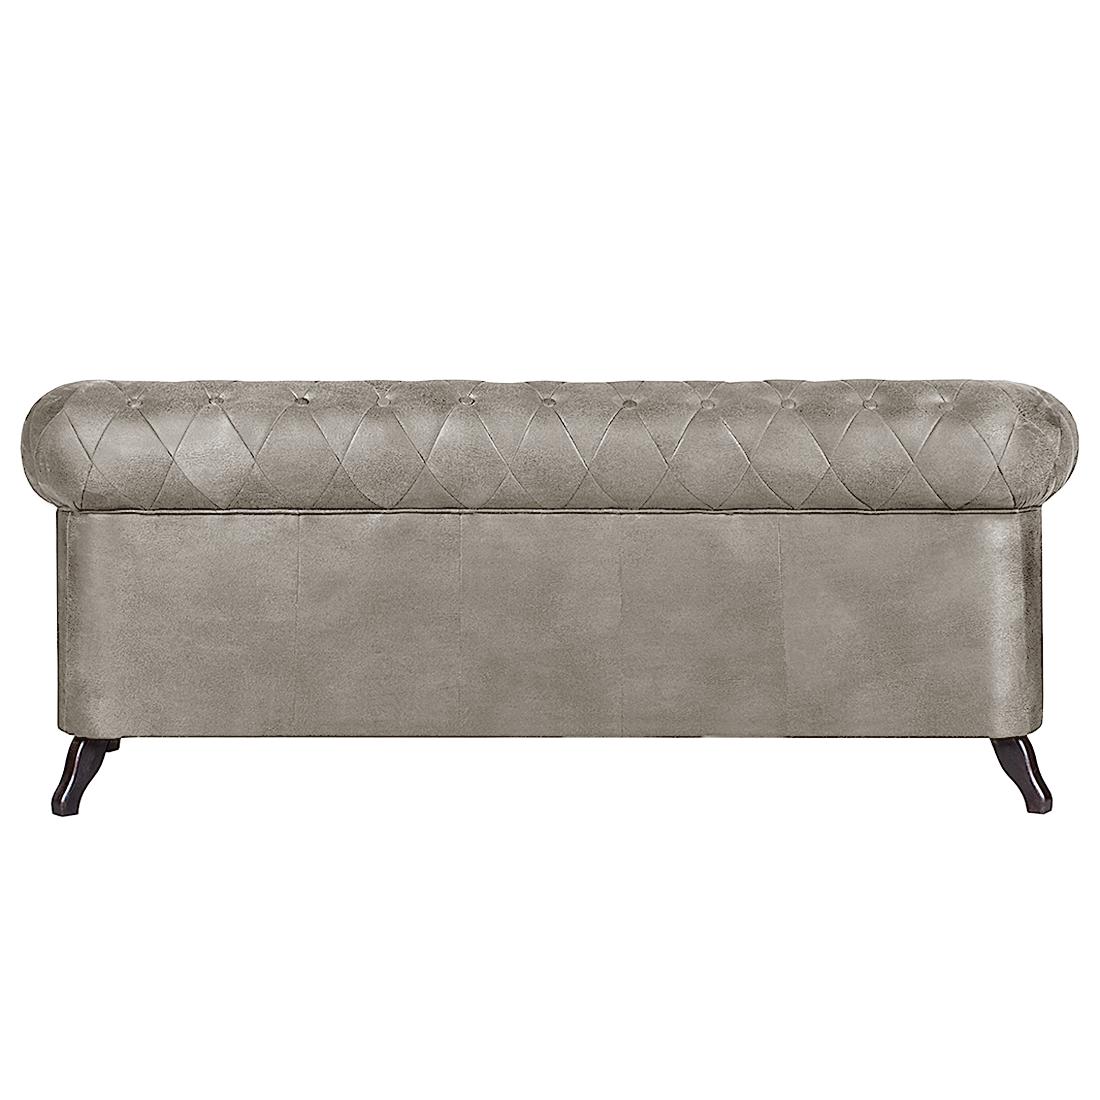 Sofa benavente 3 sitzer antiklederoptik grausilber couch ebay - Sofa antiklederoptik ...